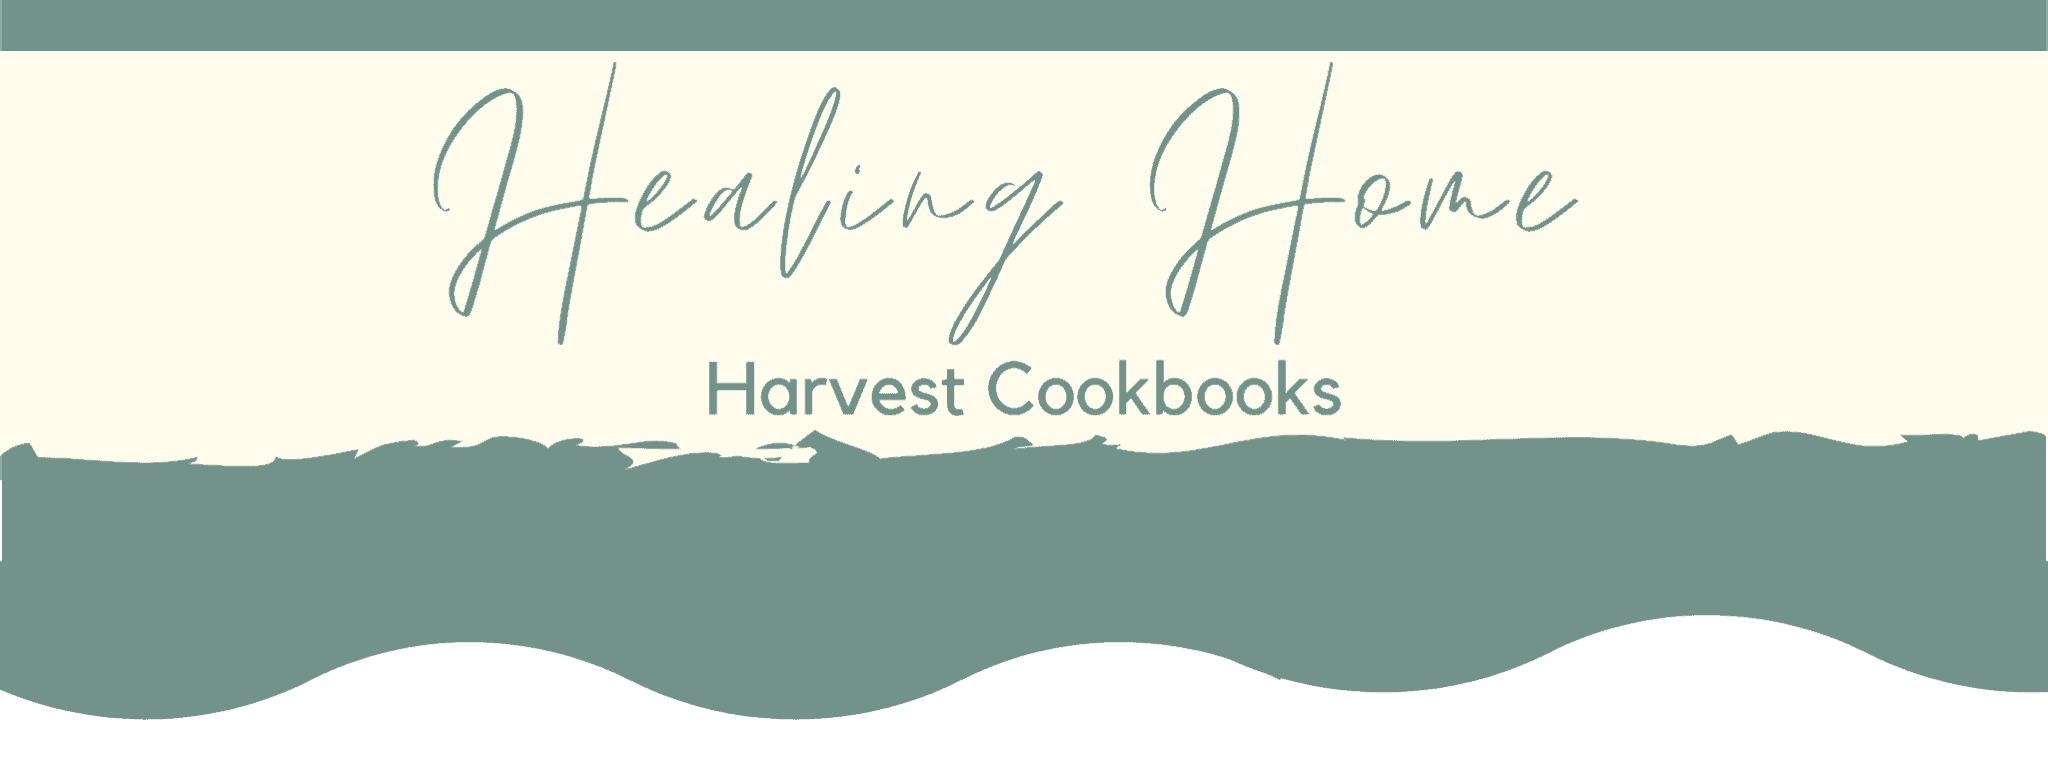 Healing Home Harvest Cookbooks